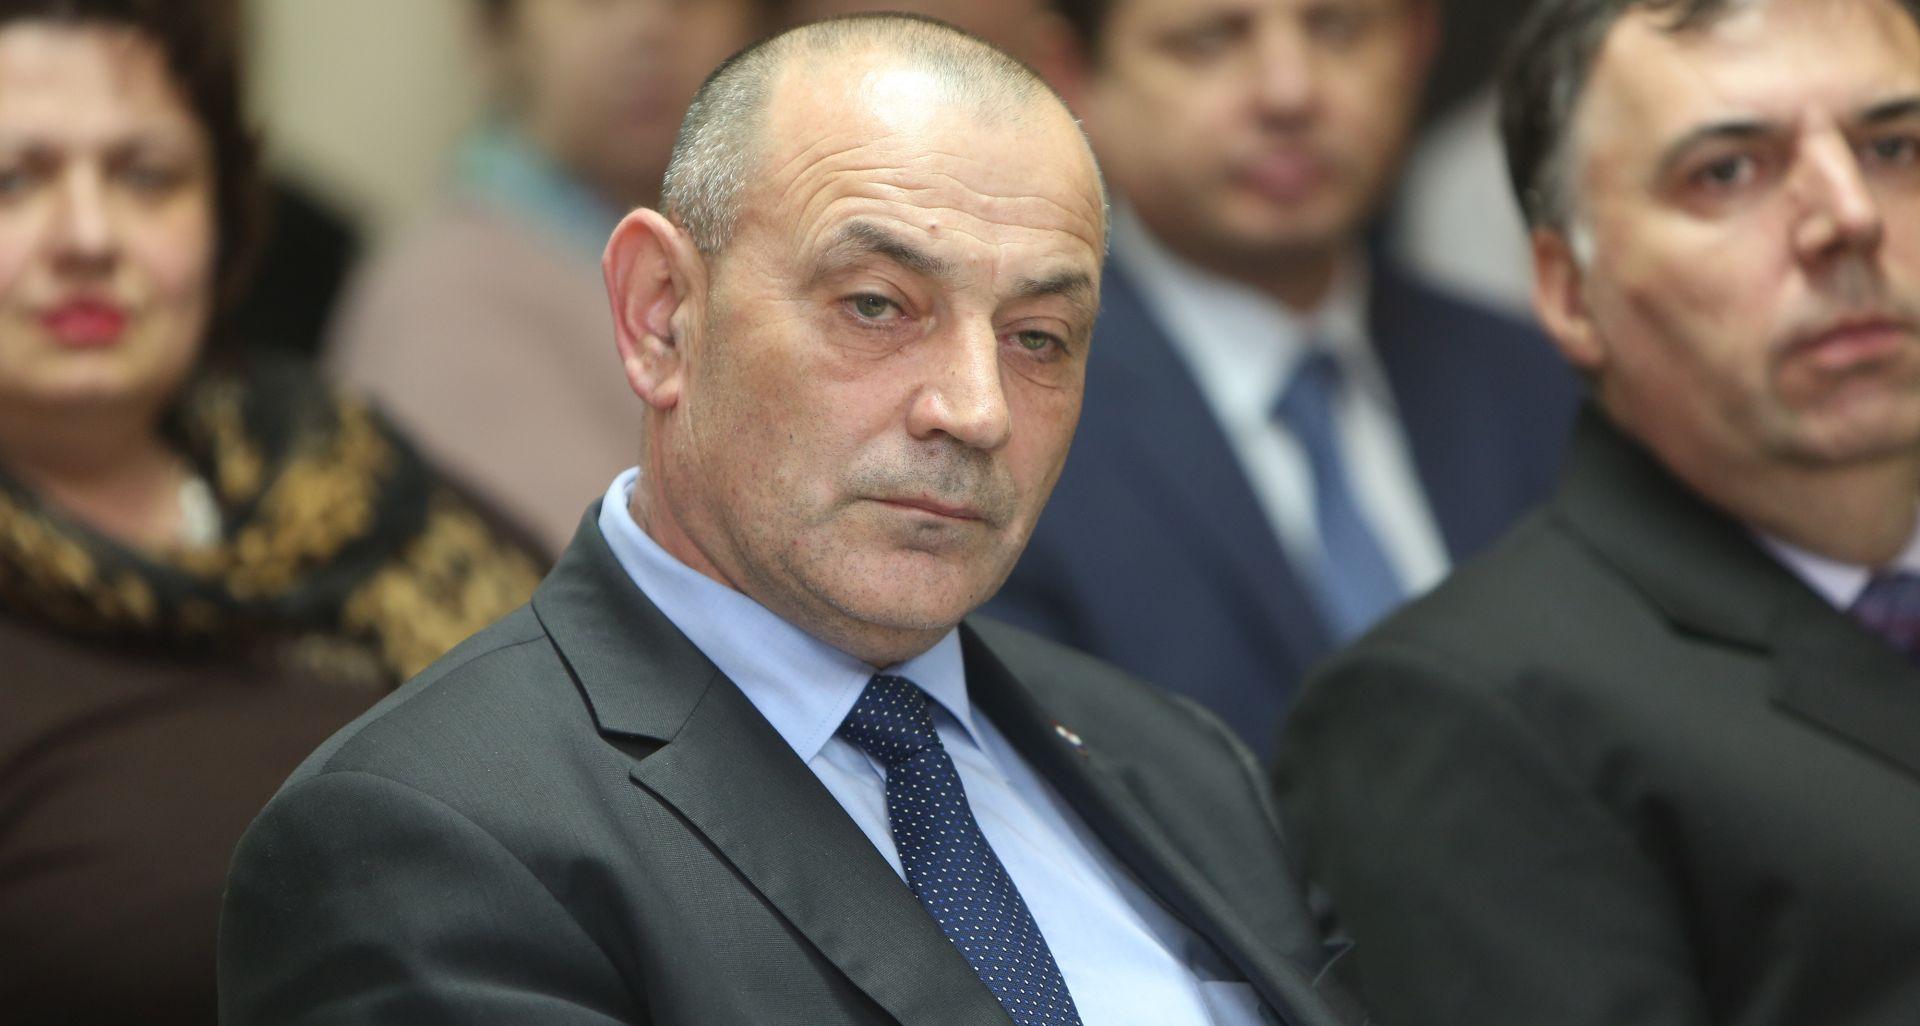 Ministar Medved u Vukovaru o braniteljskim mirovinama